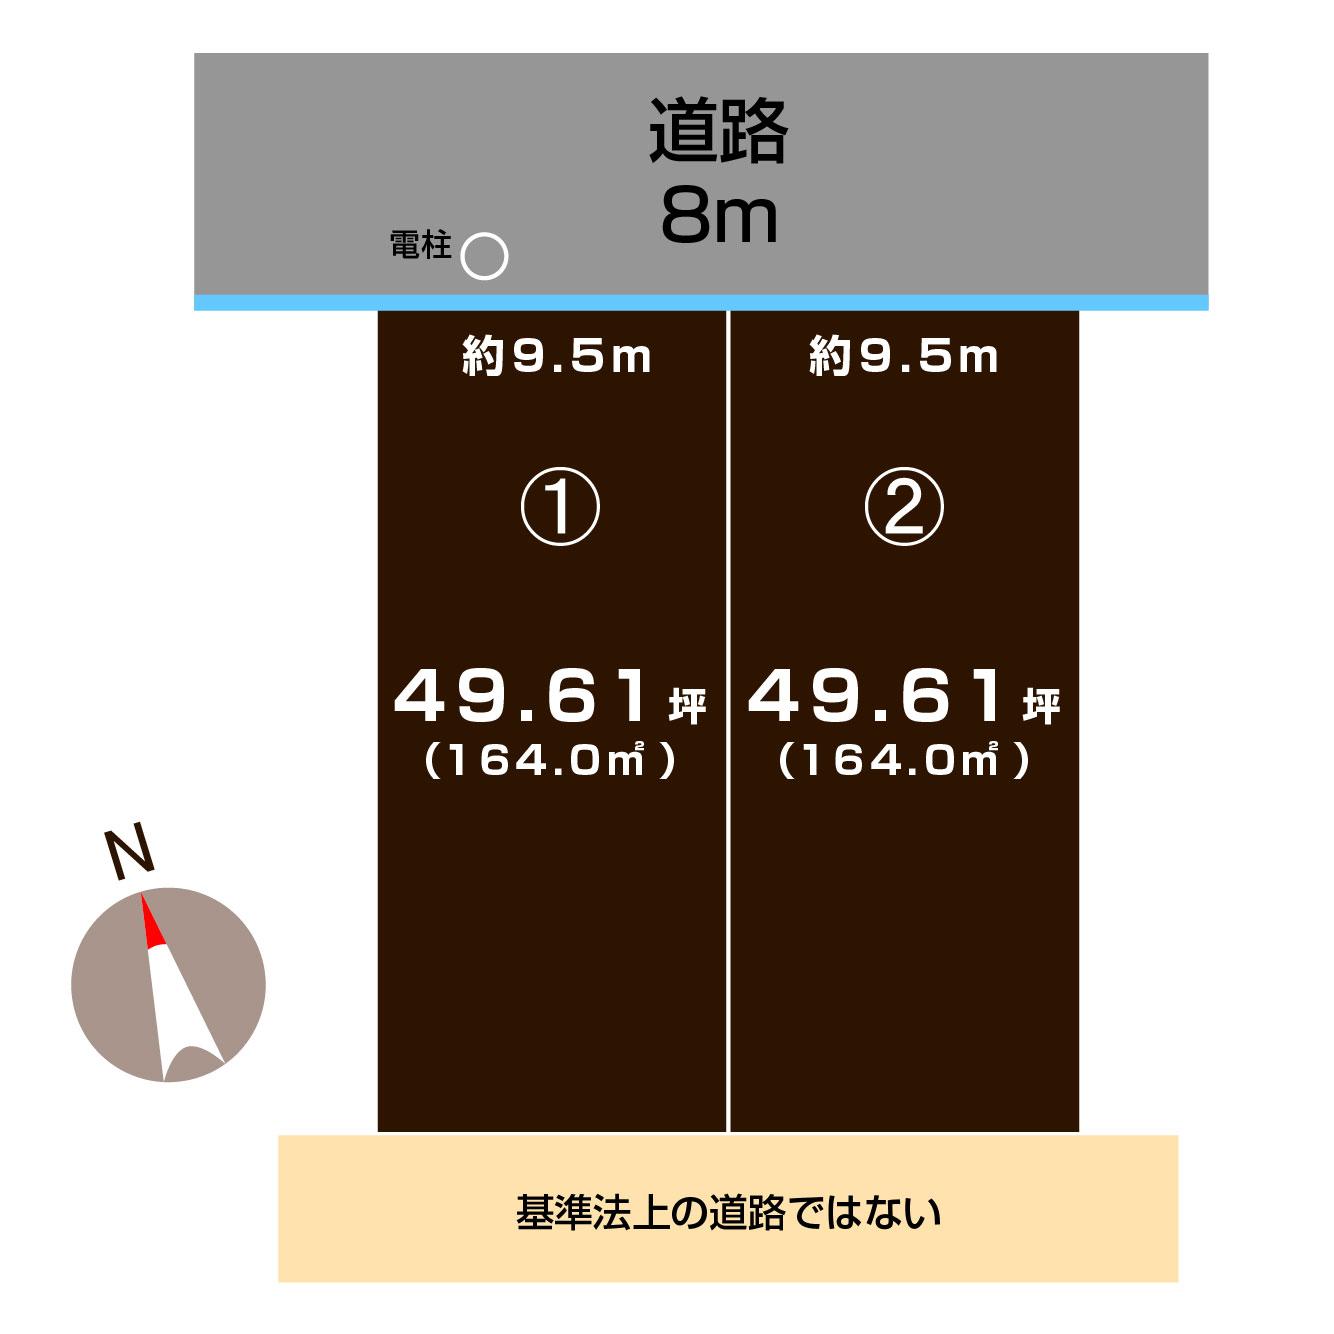 長岡市関原南の土地の敷地図(敷地図)